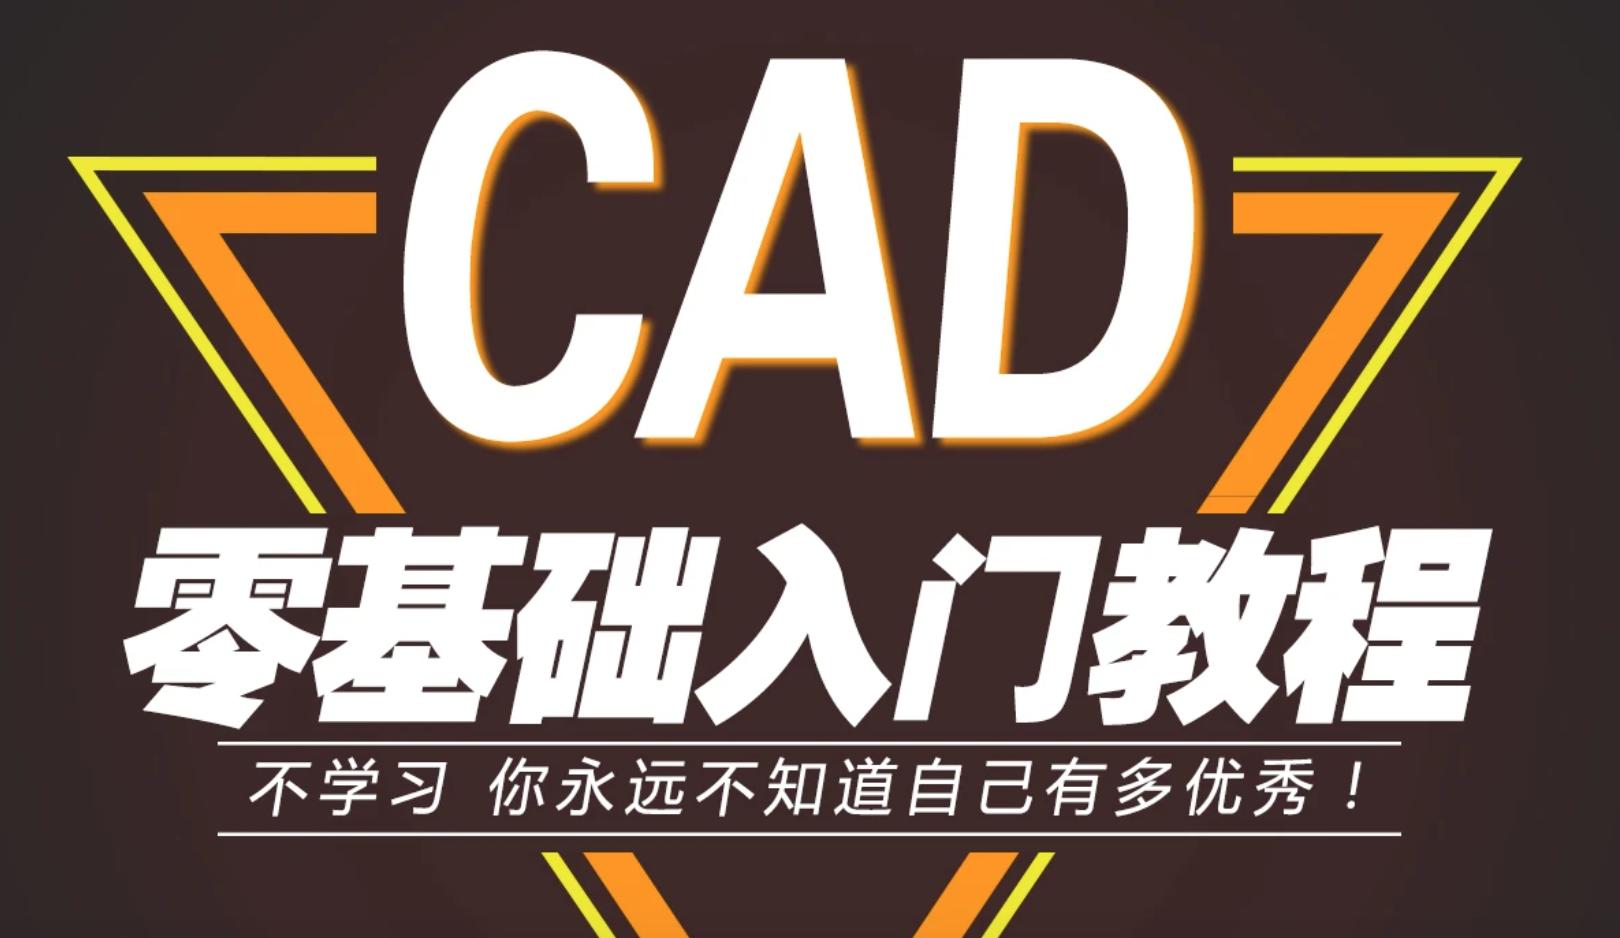 Auto CAD 零基础入门教程